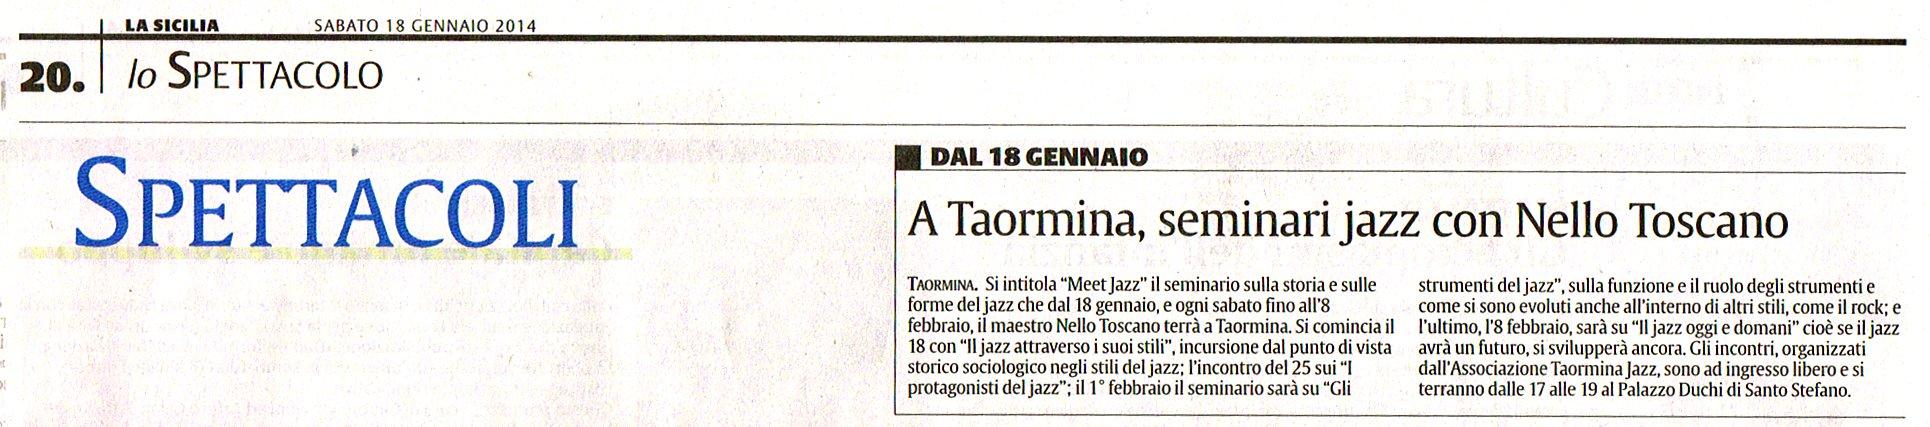 La Sicilia, 18 Gennaio 2014